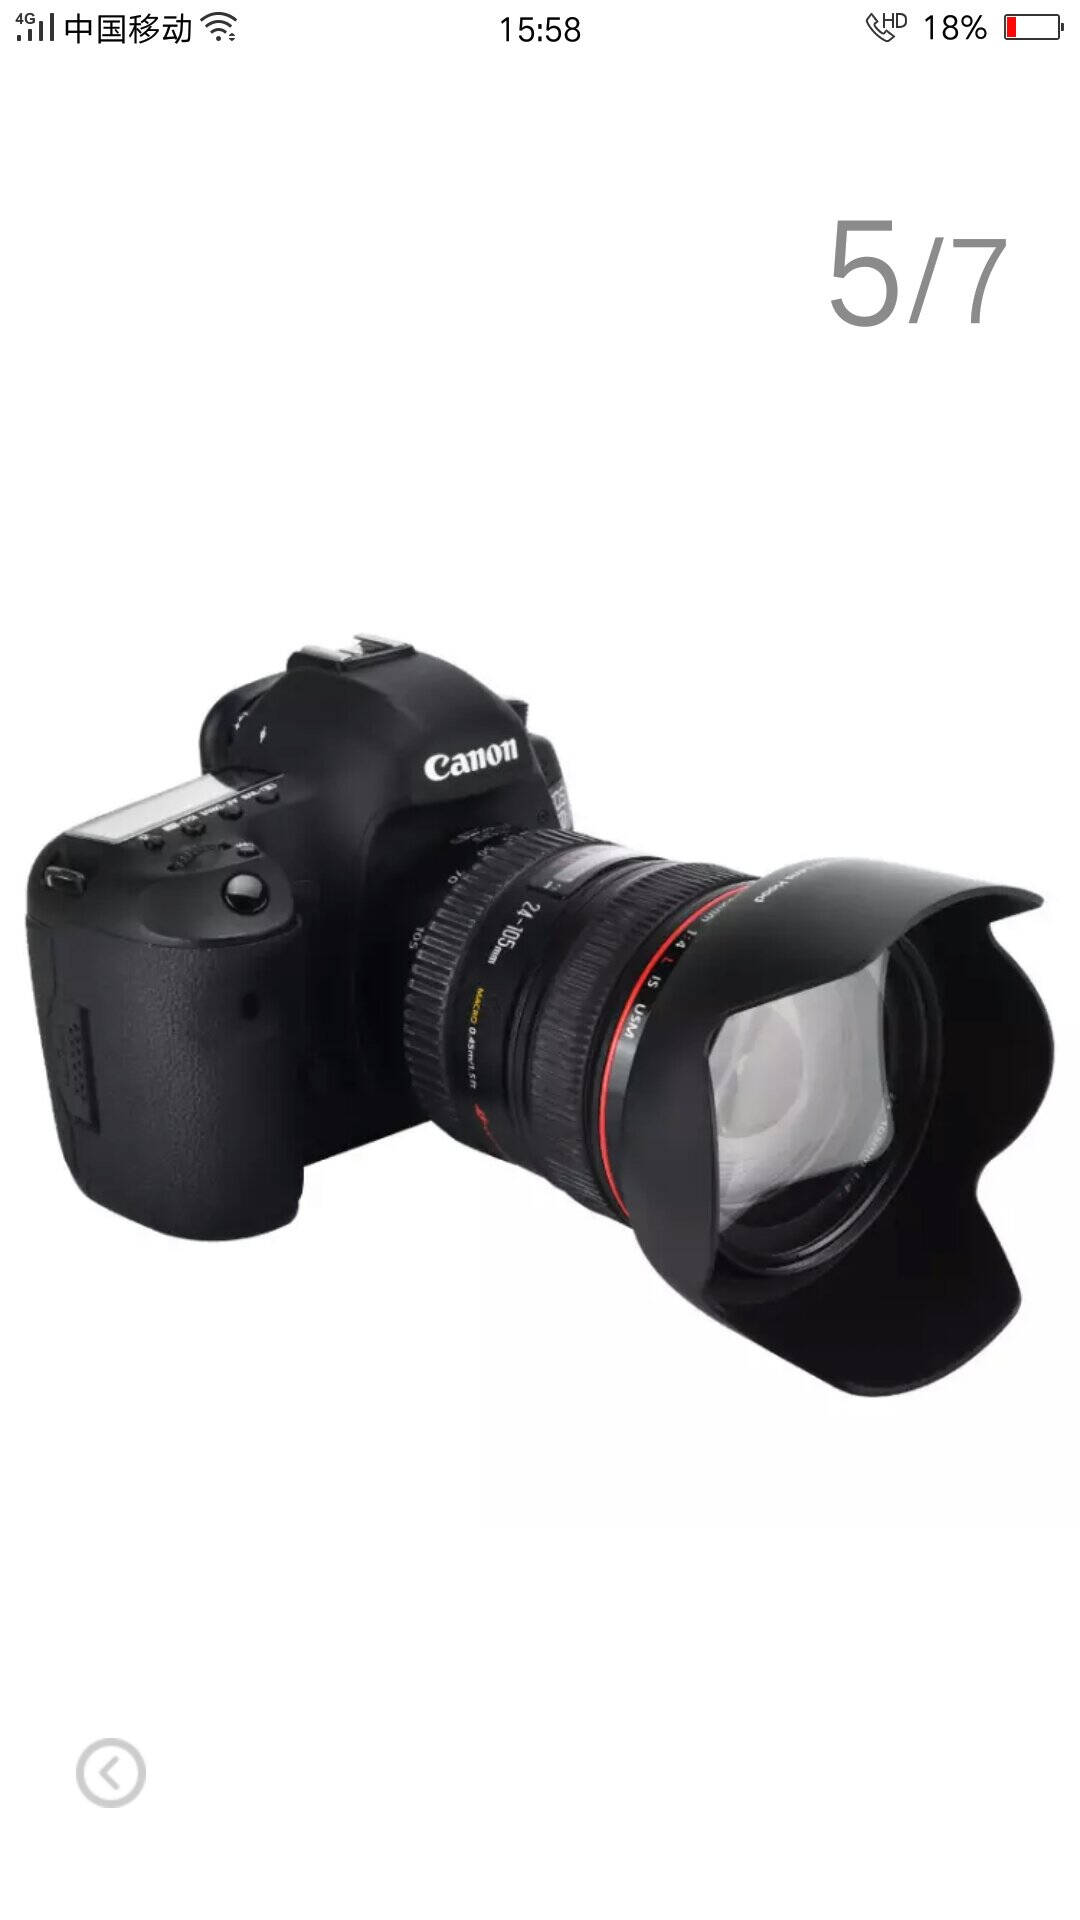 JJC佳能EW-83H遮光罩适用5D35D46D佳能24-105F4ISUSM镜头配件